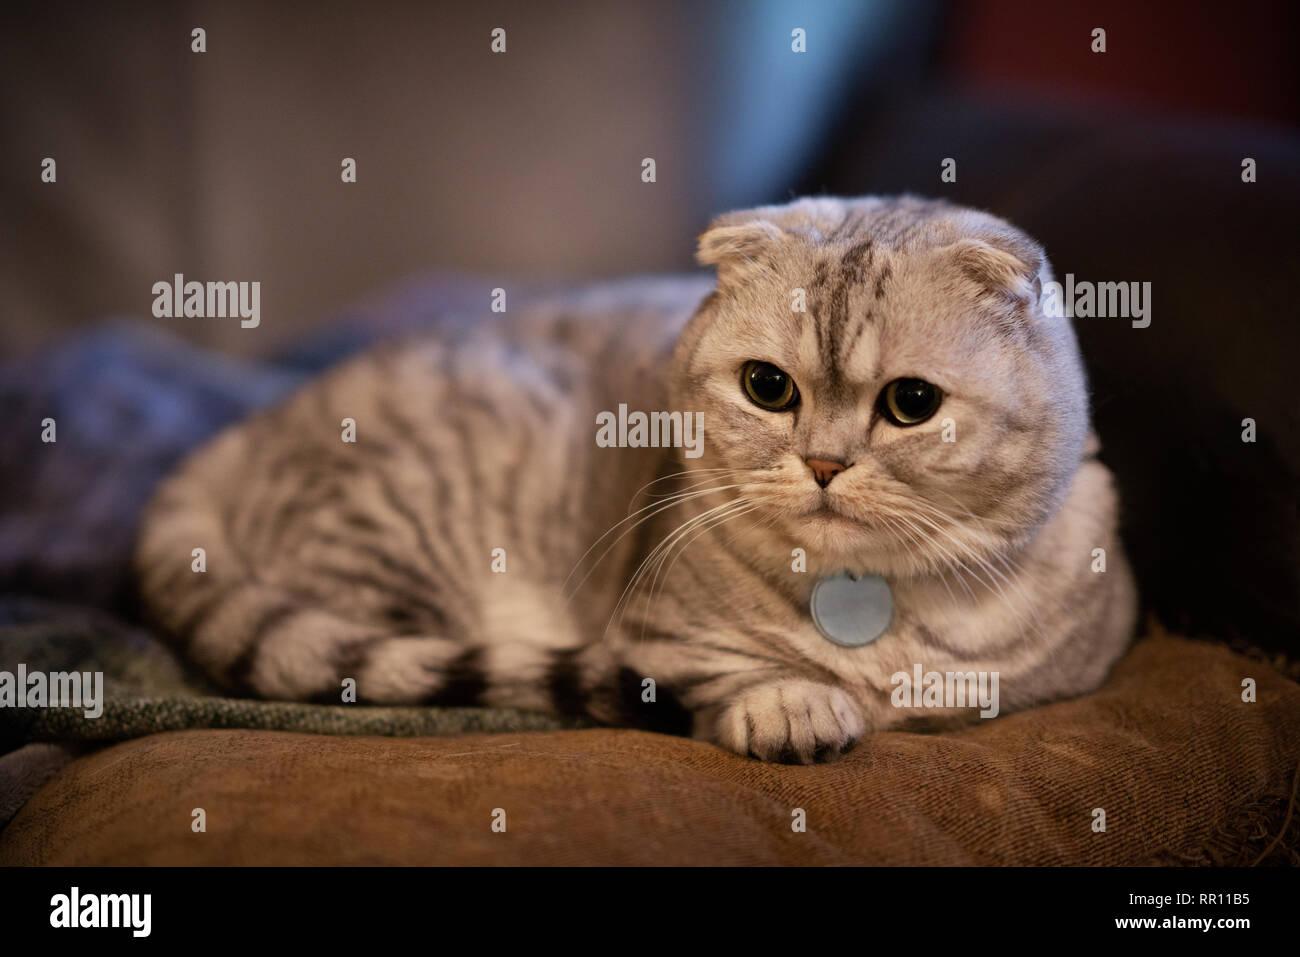 Adorable chubby scottish fold munchkin house cat lying on pillow. - Stock Image